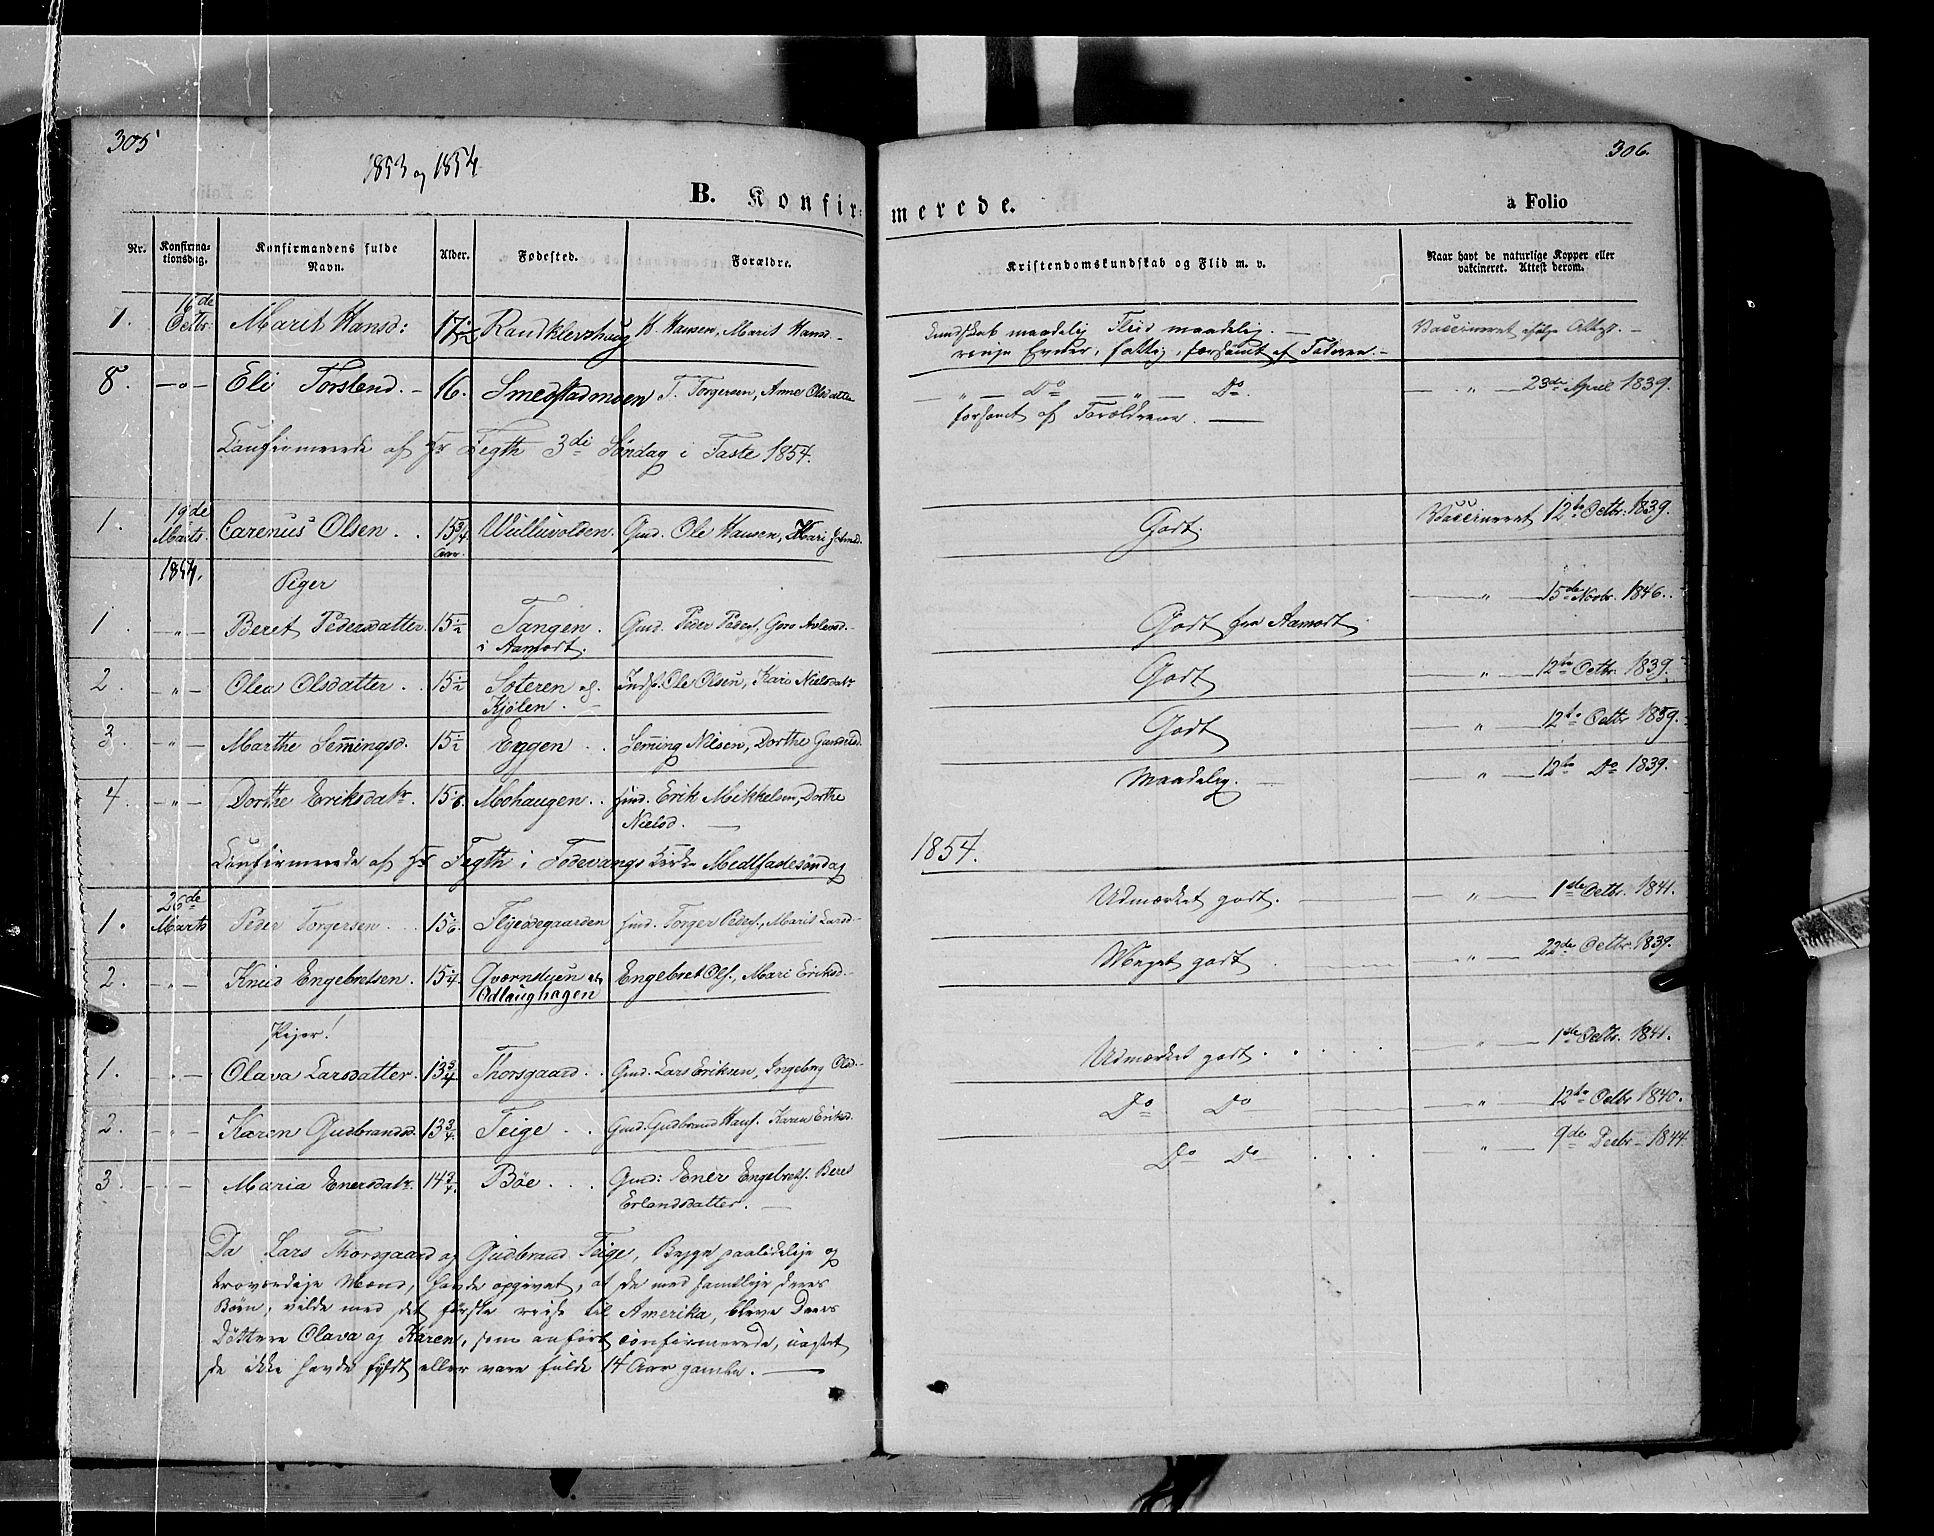 SAH, Ringebu prestekontor, Ministerialbok nr. 6, 1848-1859, s. 305-306